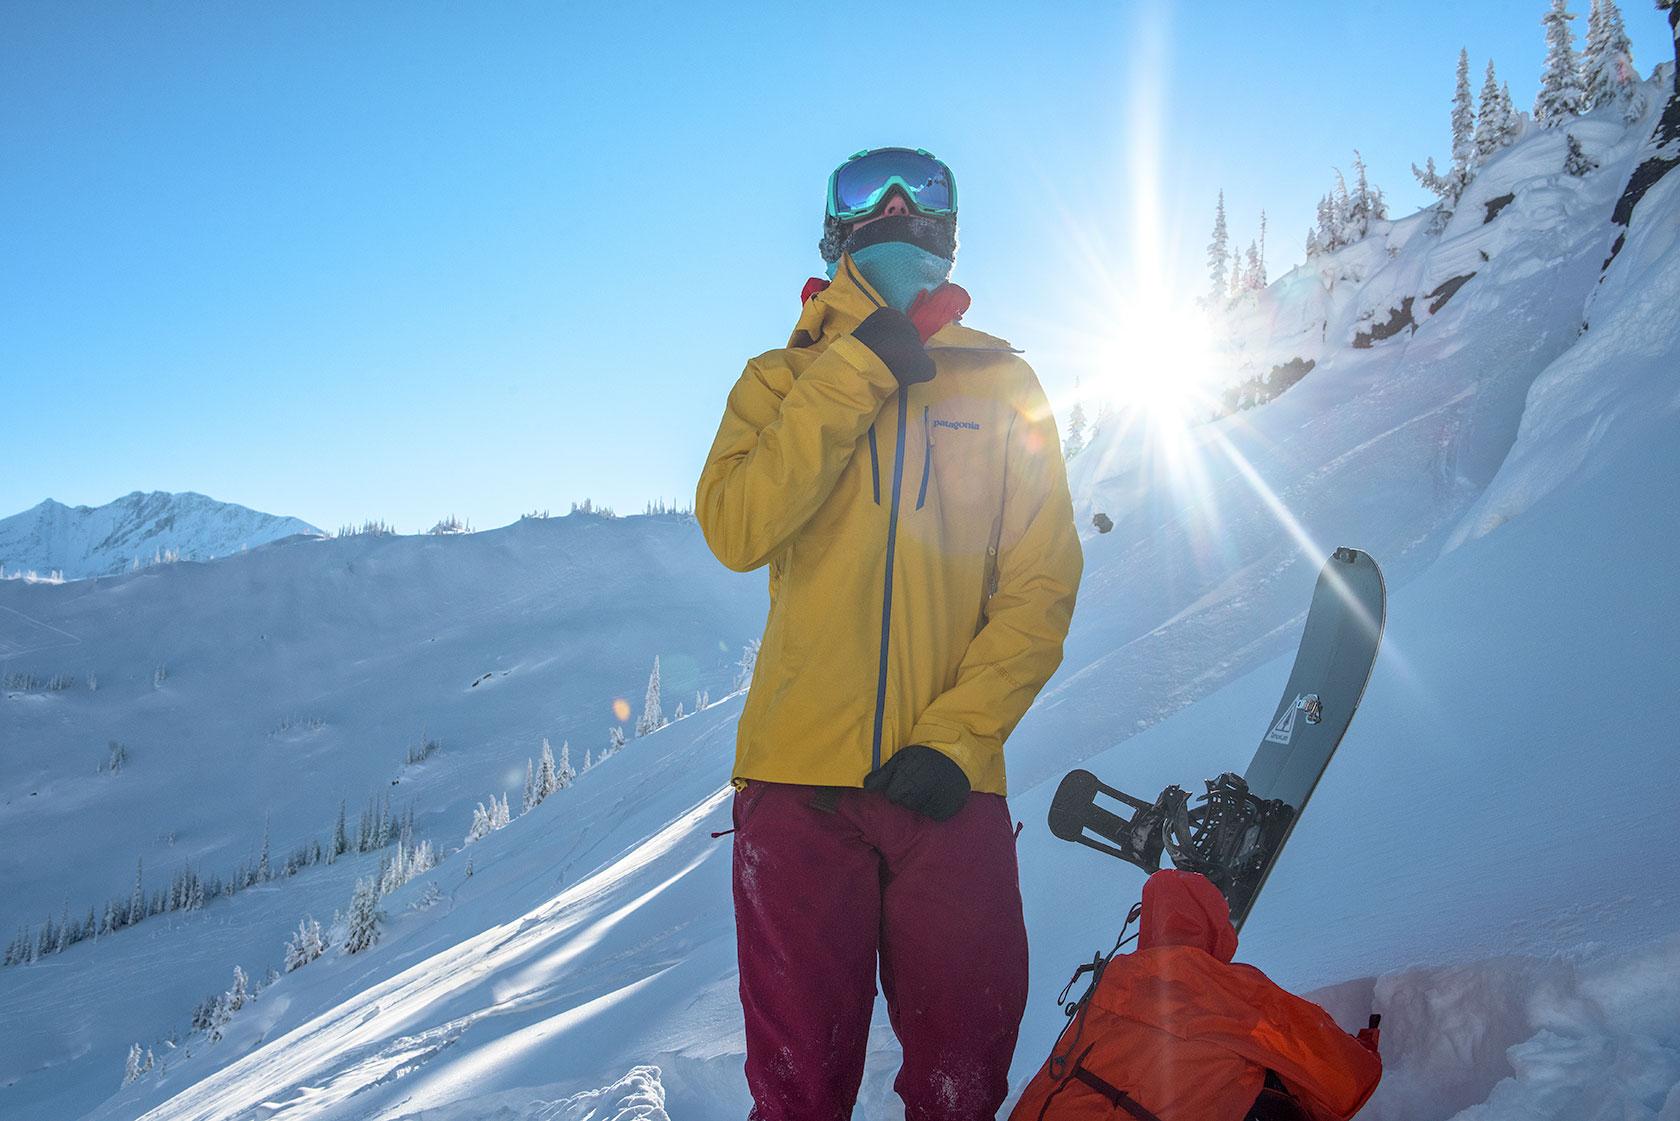 austin-trigg-patagonia-banff-alberta-winter-rogers-pass-zip-jacket-layers-canada-lifestyle-adventure-mountains-splitboarding.jpg